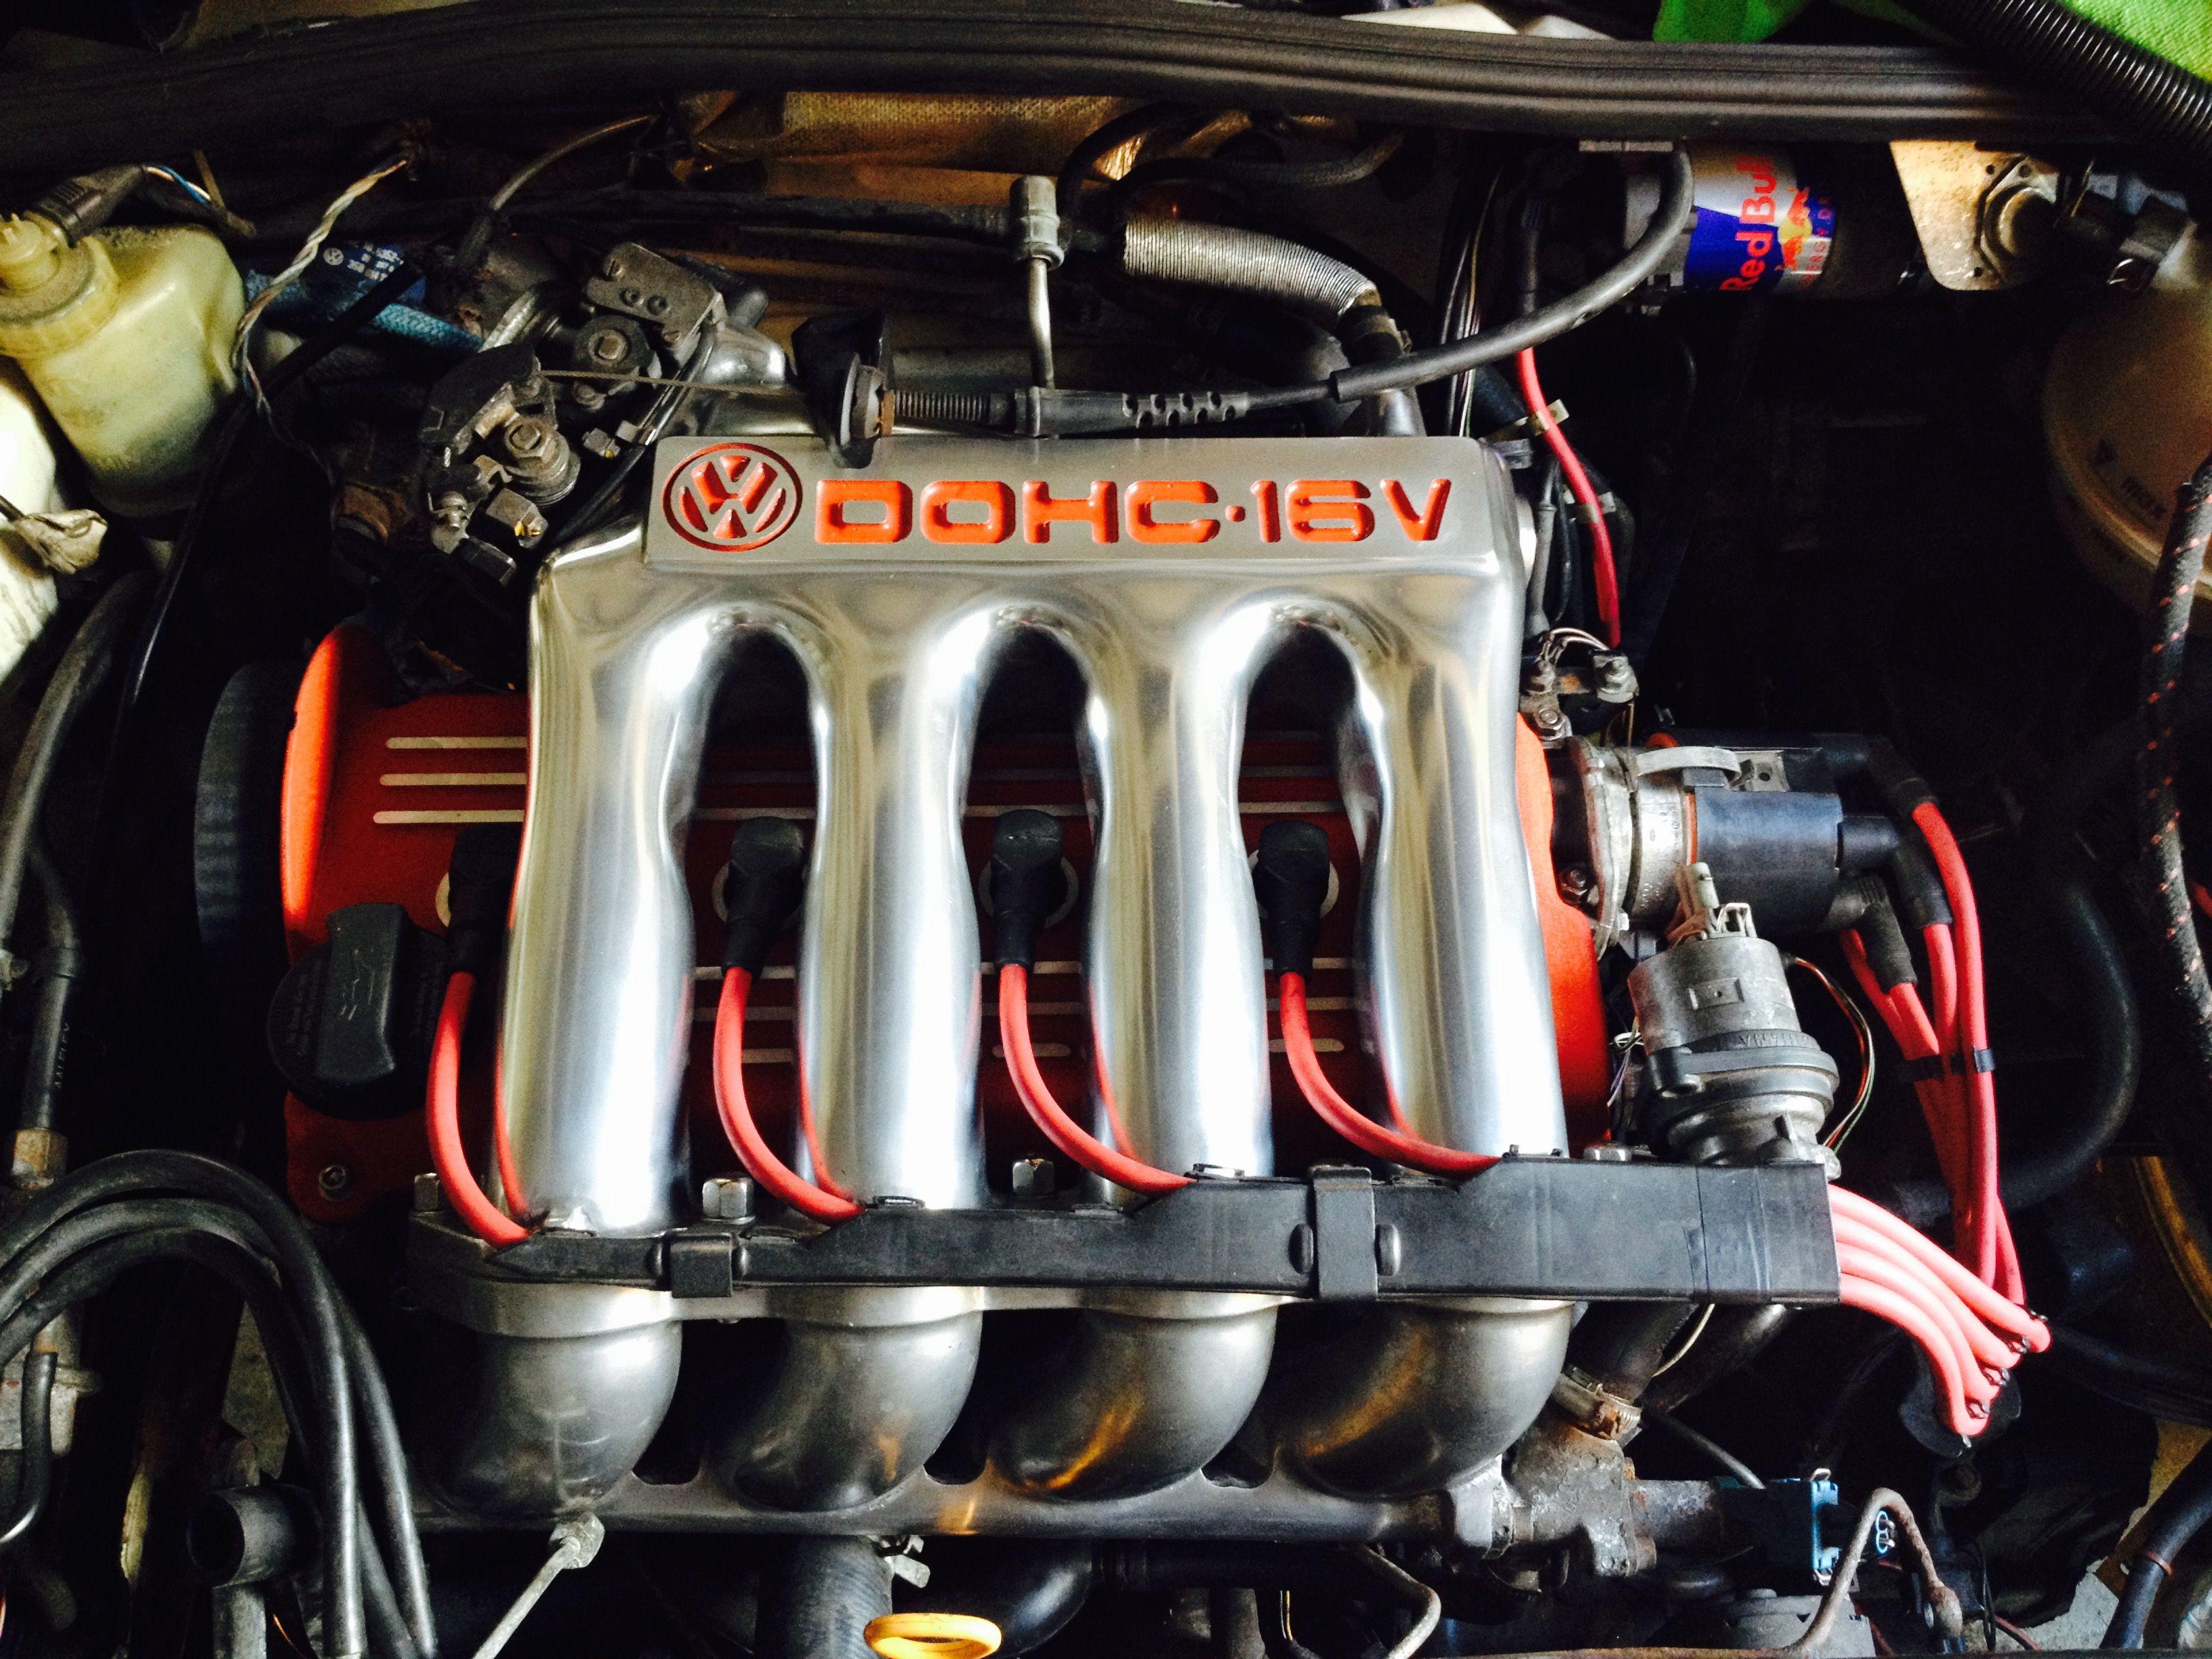 vw corrado 2.0 16v engine